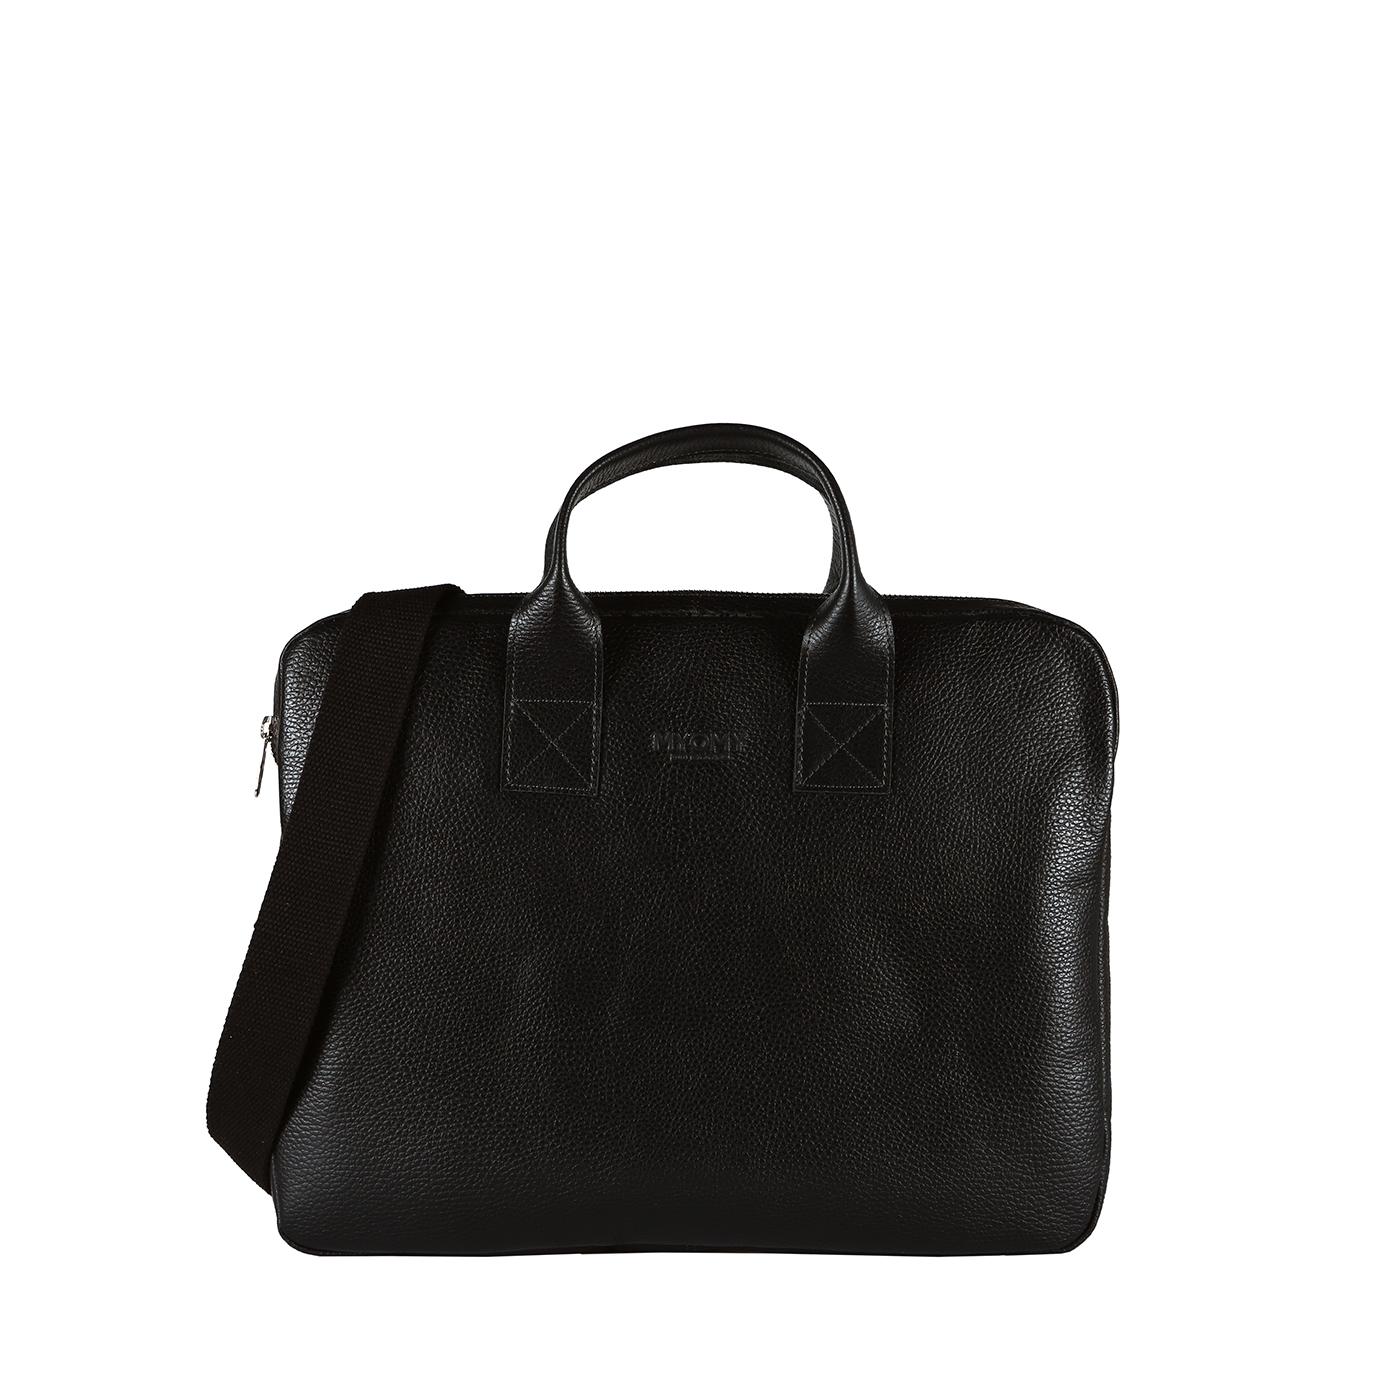 MY PHILIP BAG Laptop - rambler black